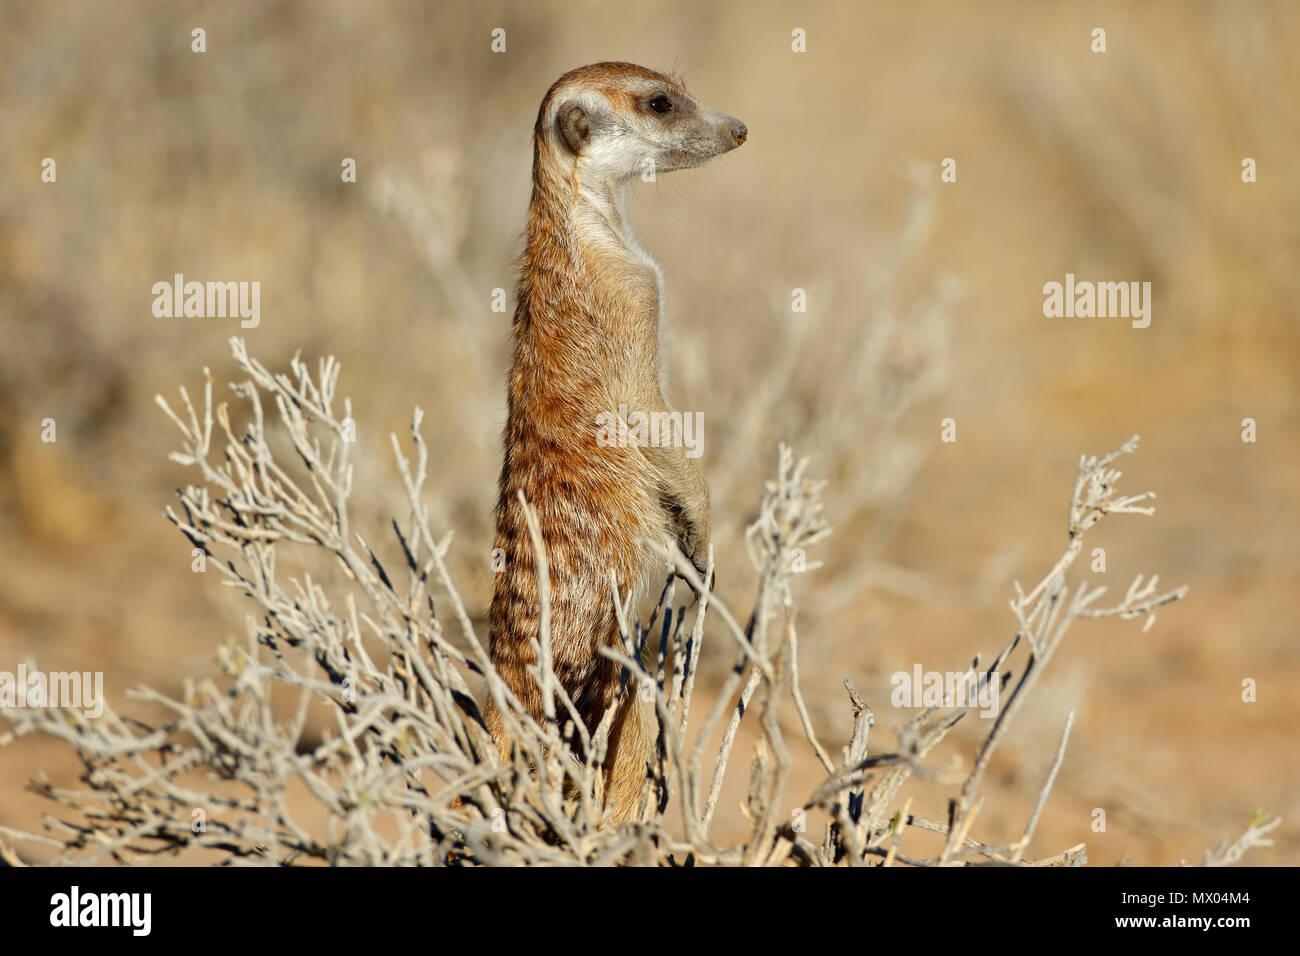 Alert meerkat (Suricata suricatta) standing on guard, Kalahari desert, South Africa Stock Photo